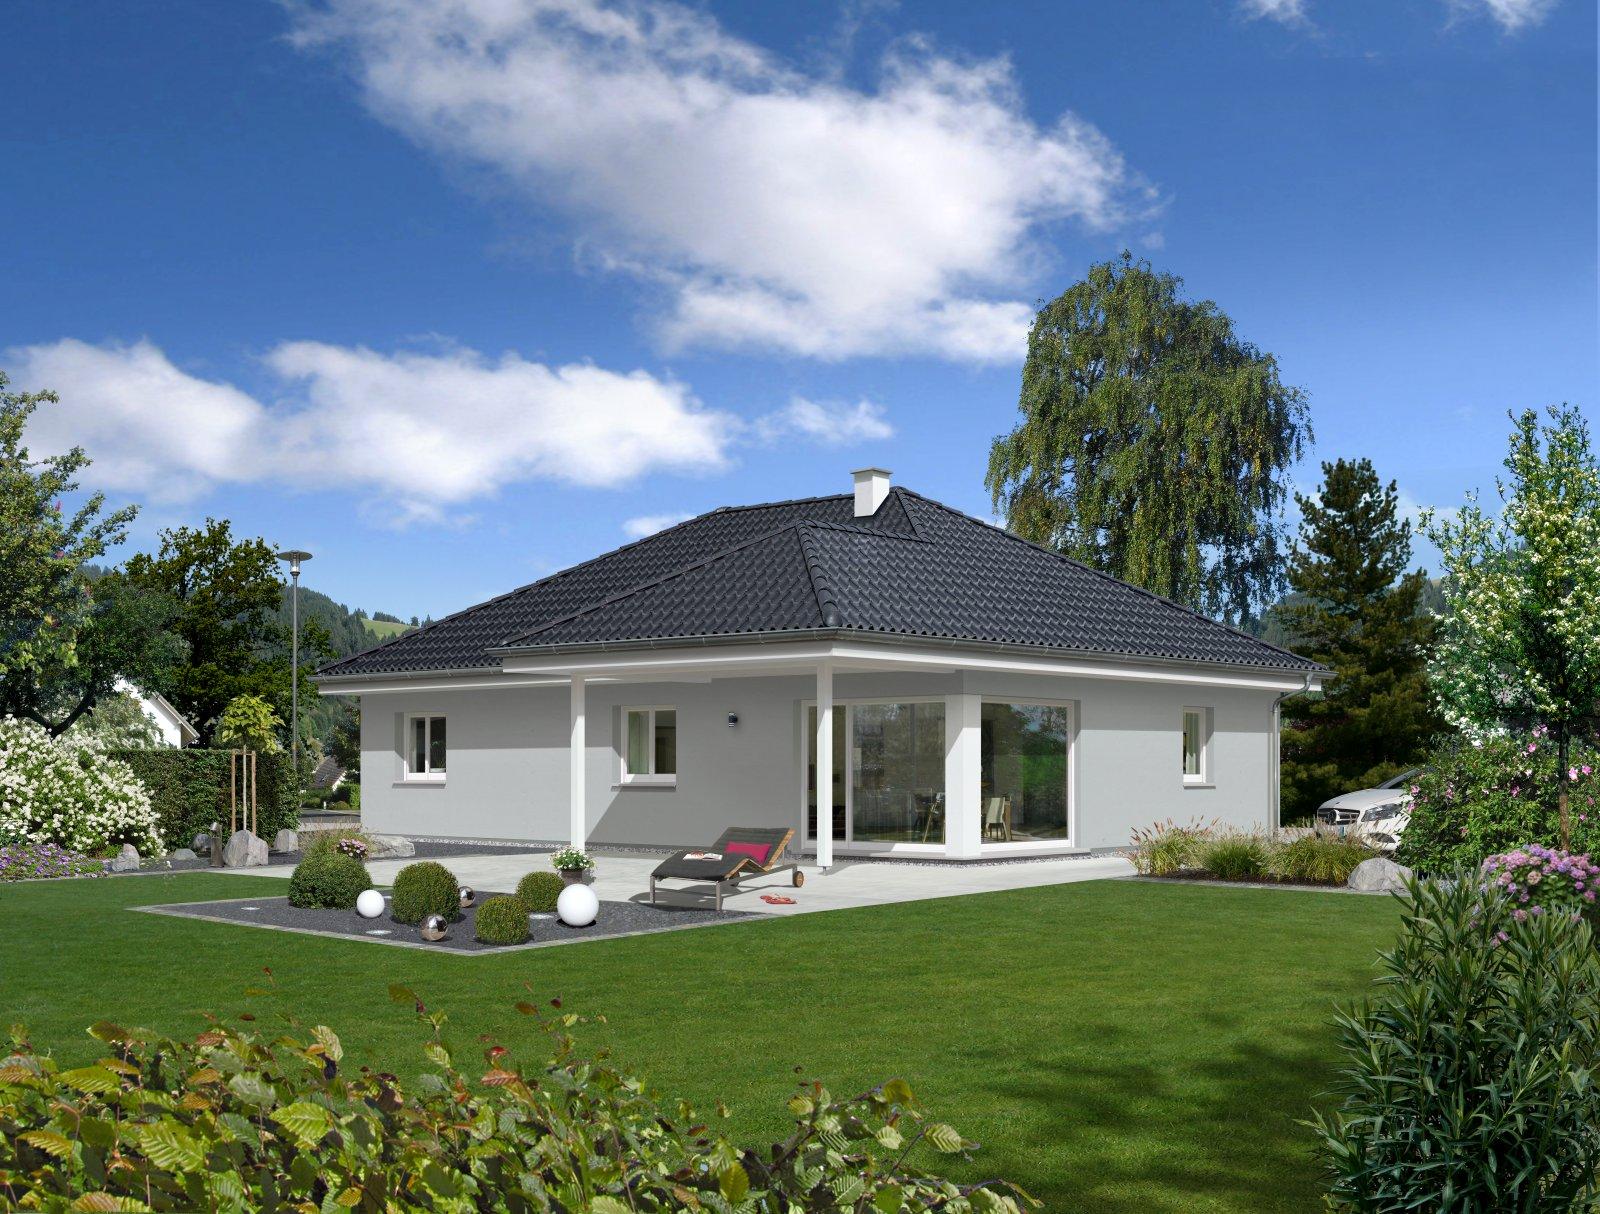 Trend 112 W - Panoramaverglasung und Terrassenüberdachung